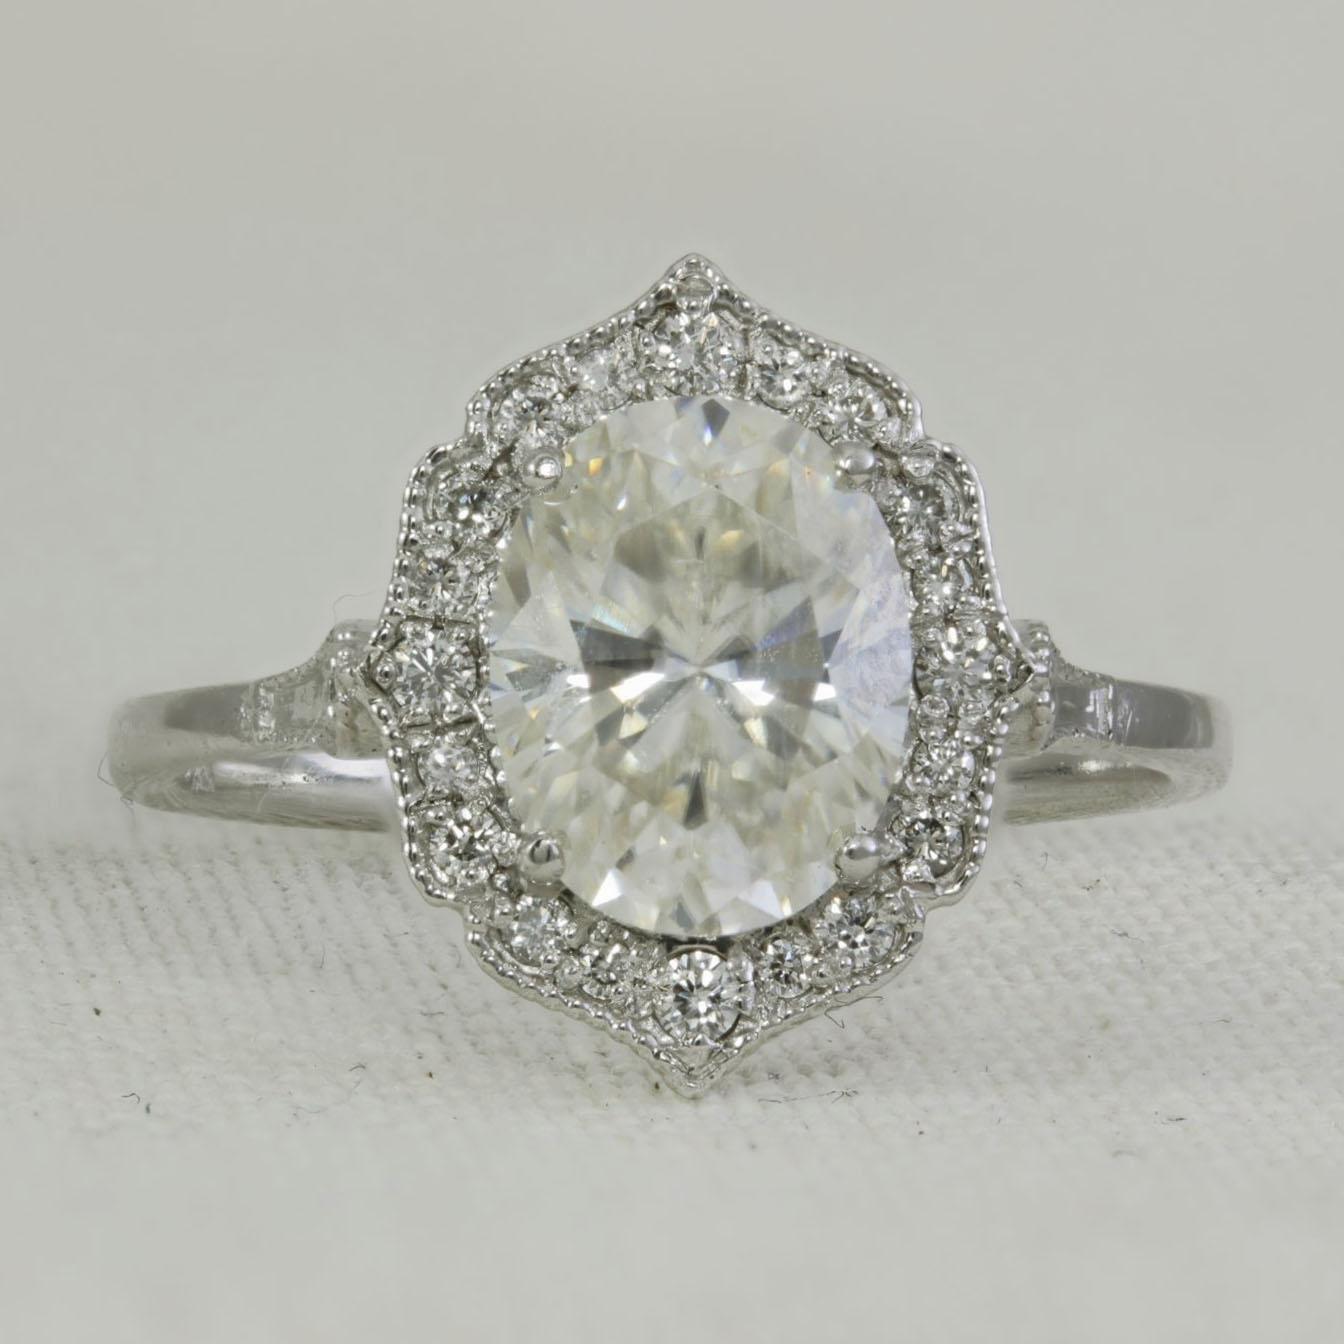 Moissanite Diamond Antique Style Ring